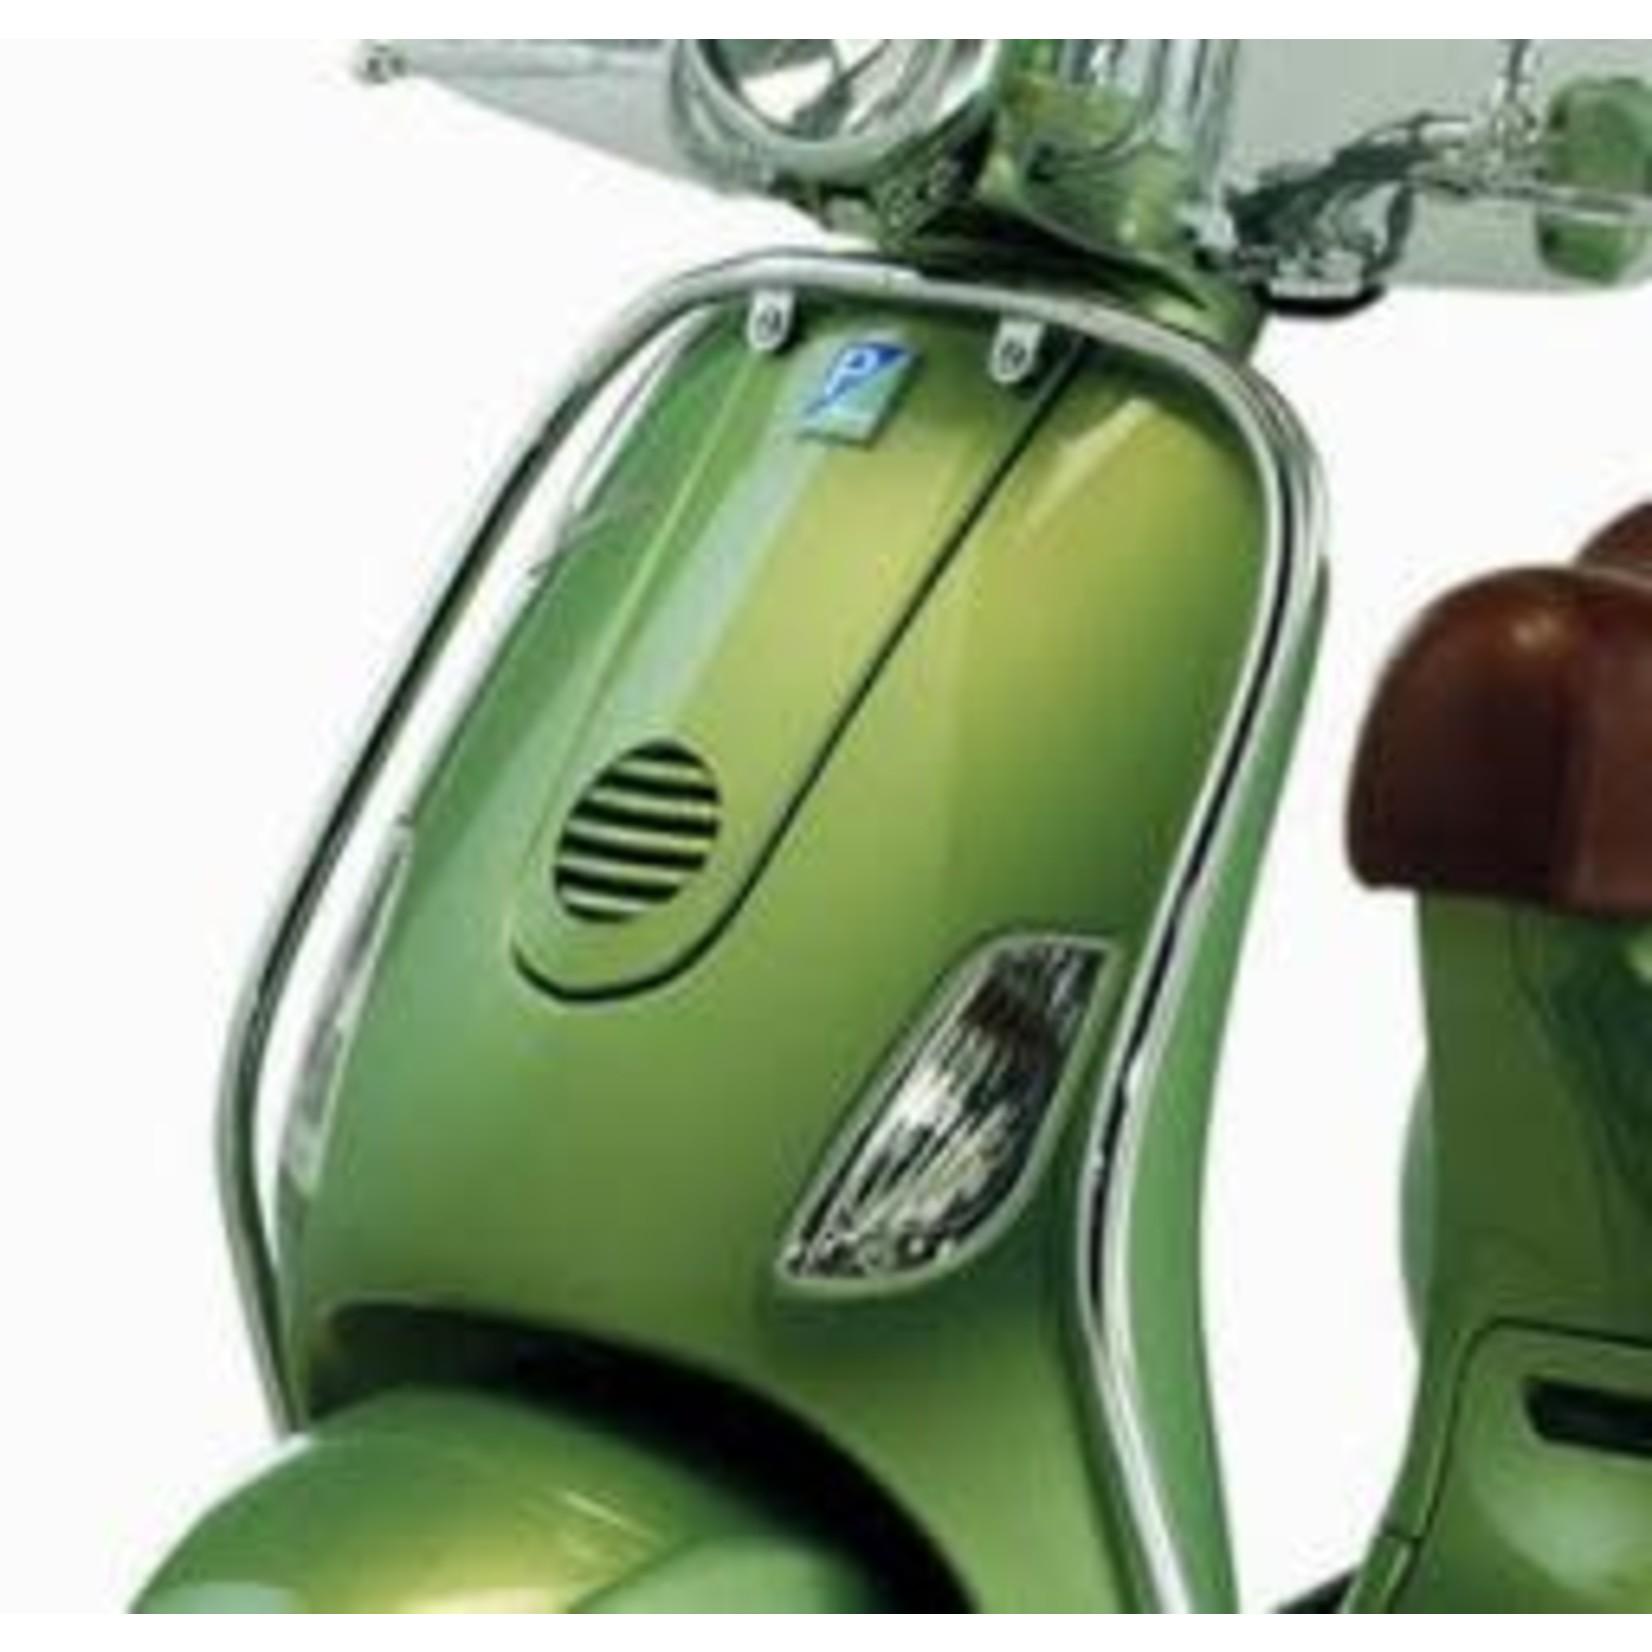 Accessories Protector, LX/LXV Legshield Bars